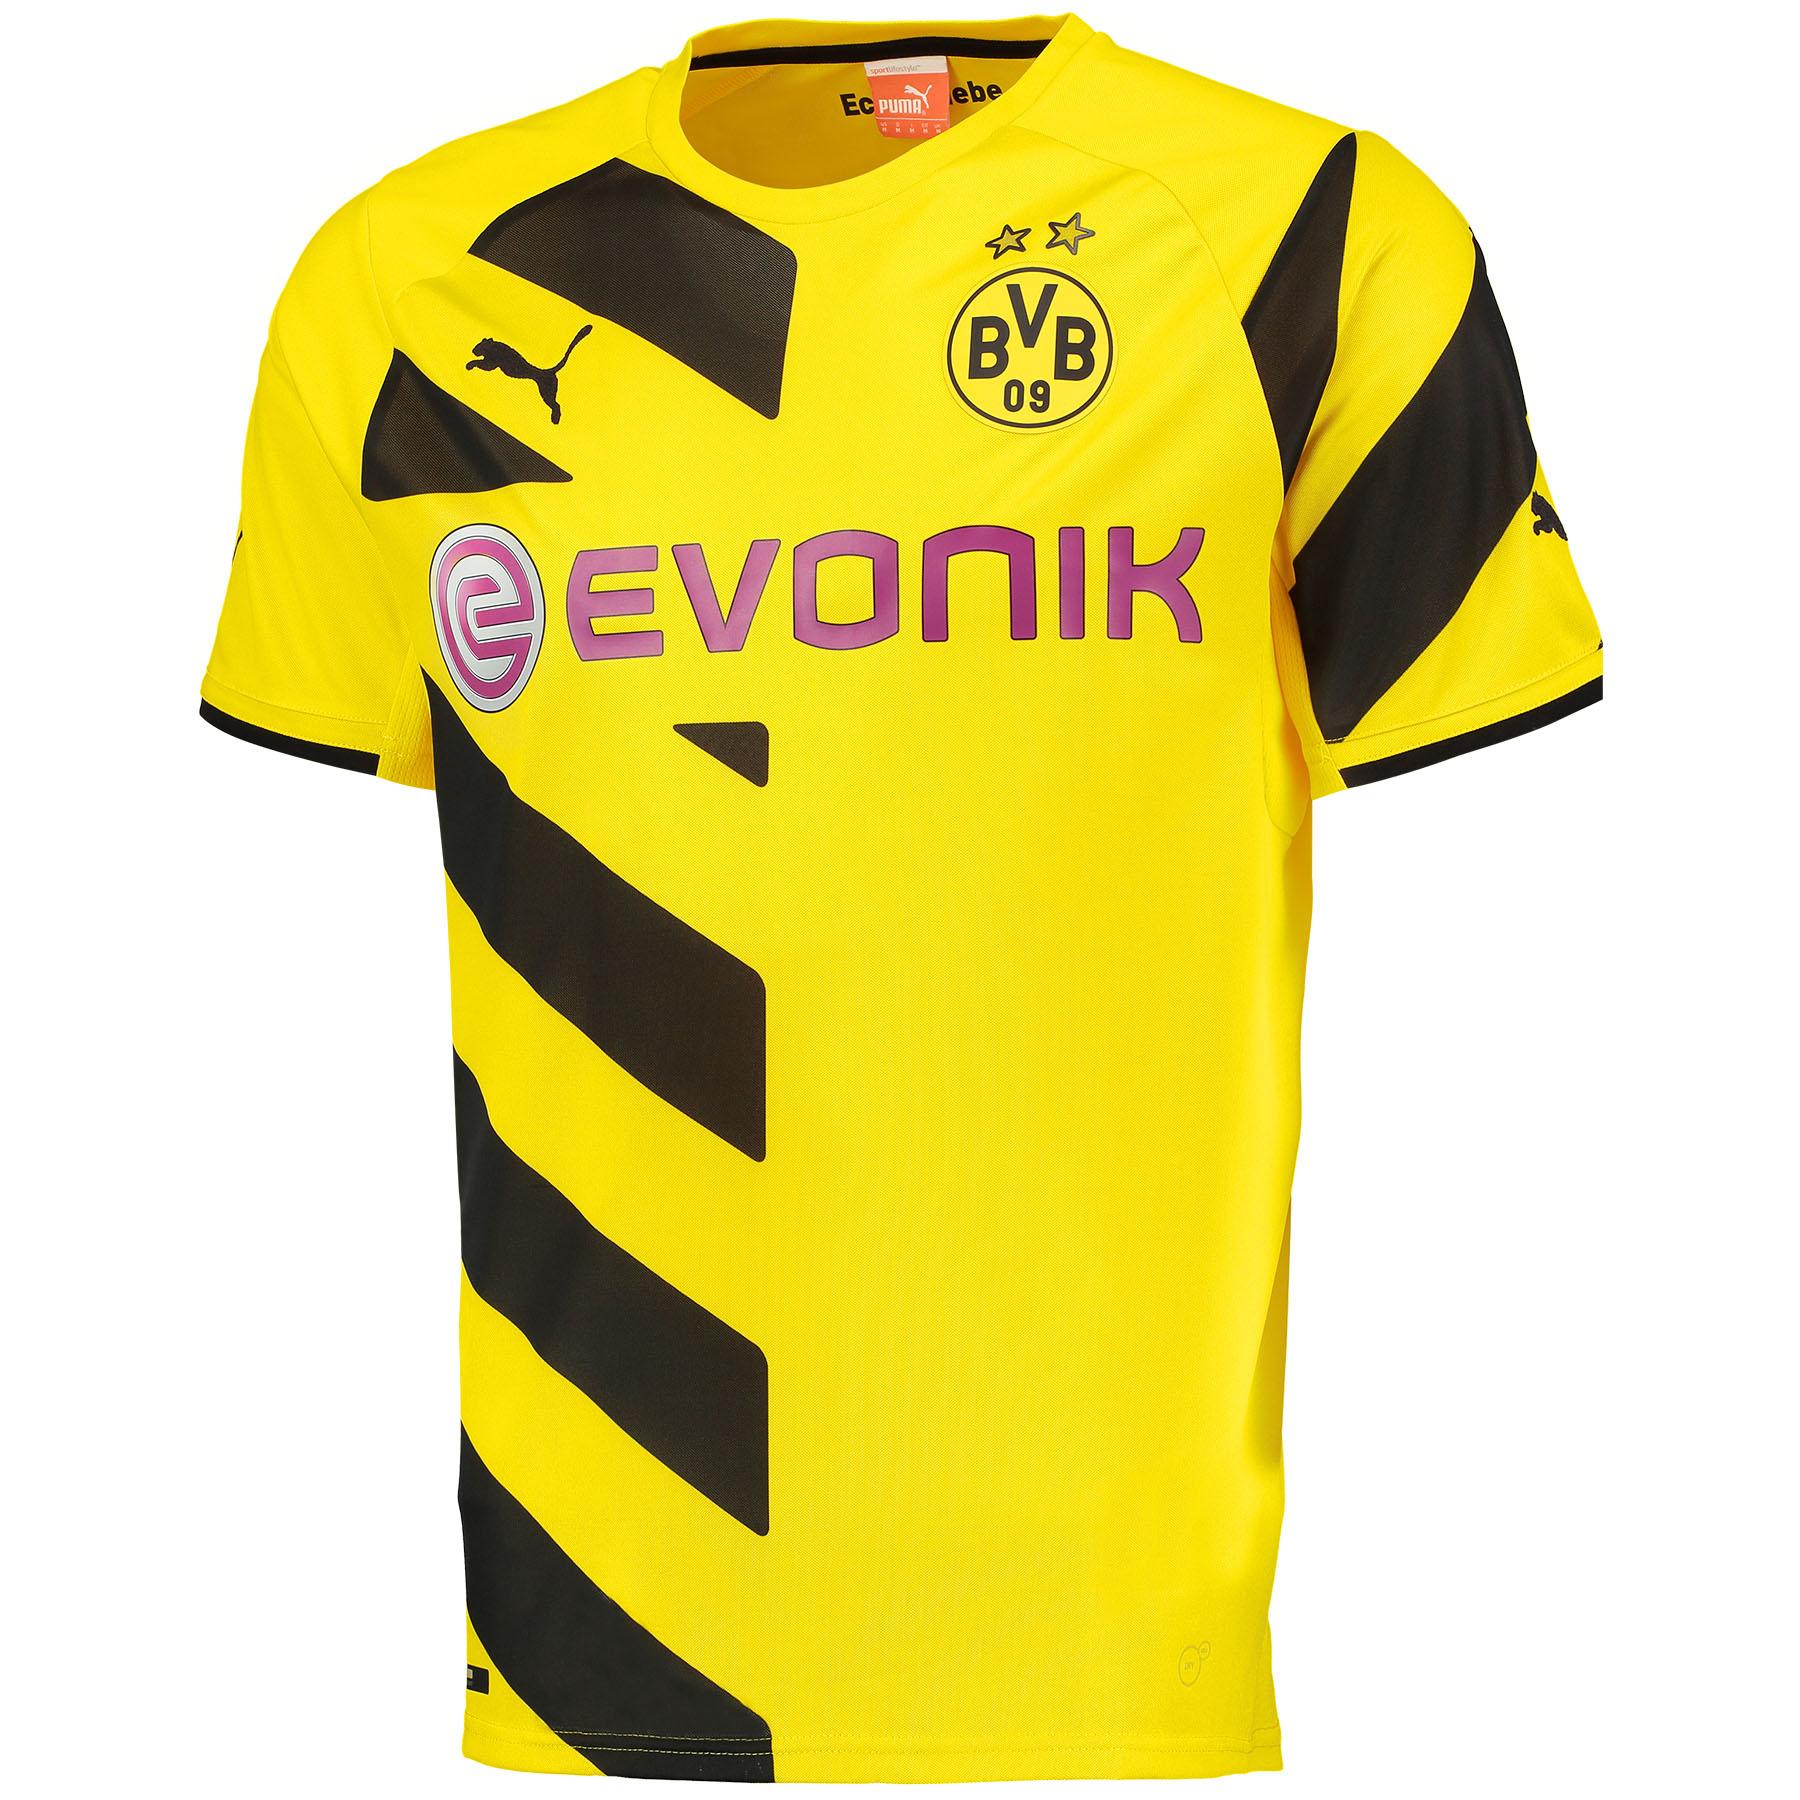 BVB Home Shirt 2014/15